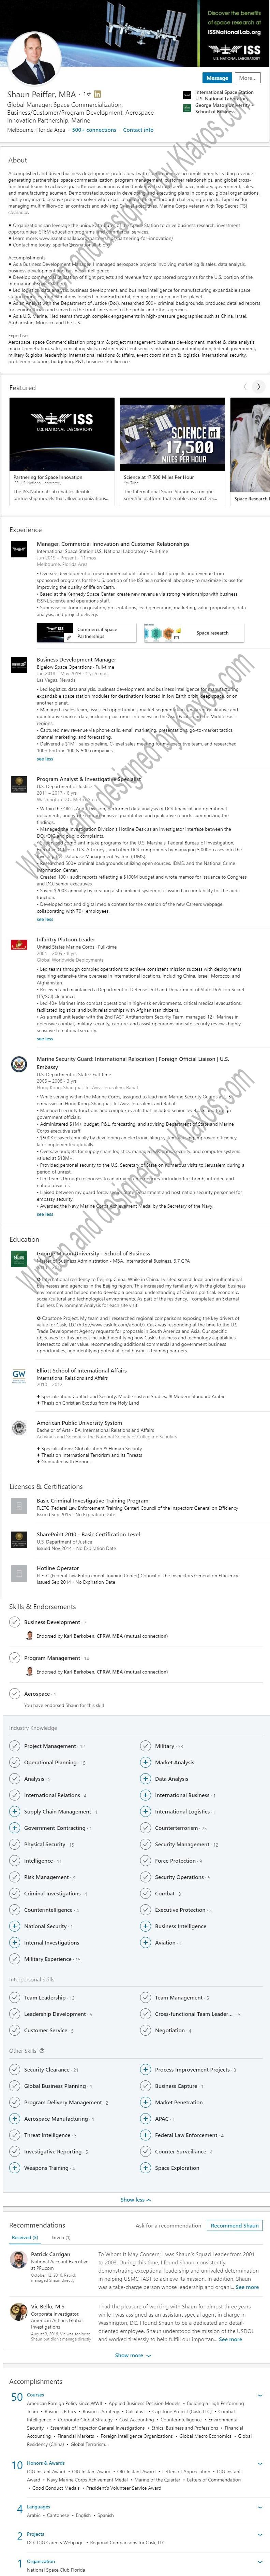 Linkedin profile example Aerospace space station commercialization Profile 1339 200416